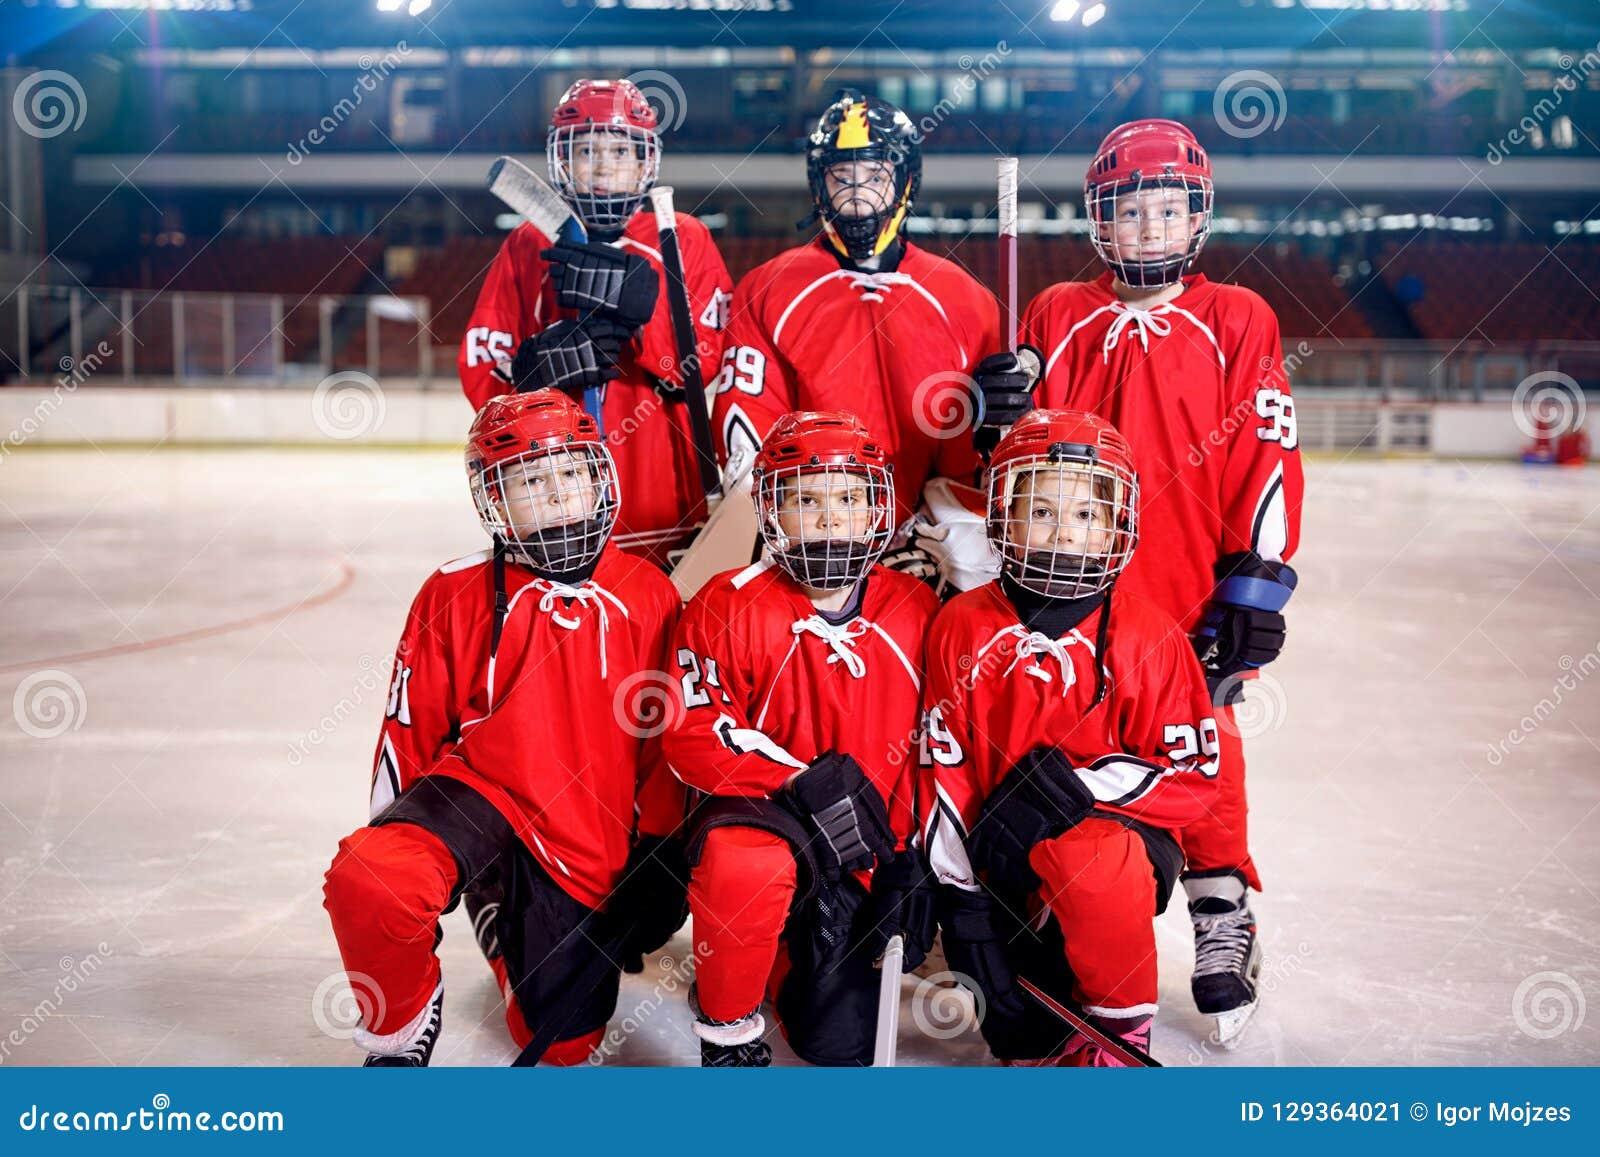 Ice hockey boys players team portrait